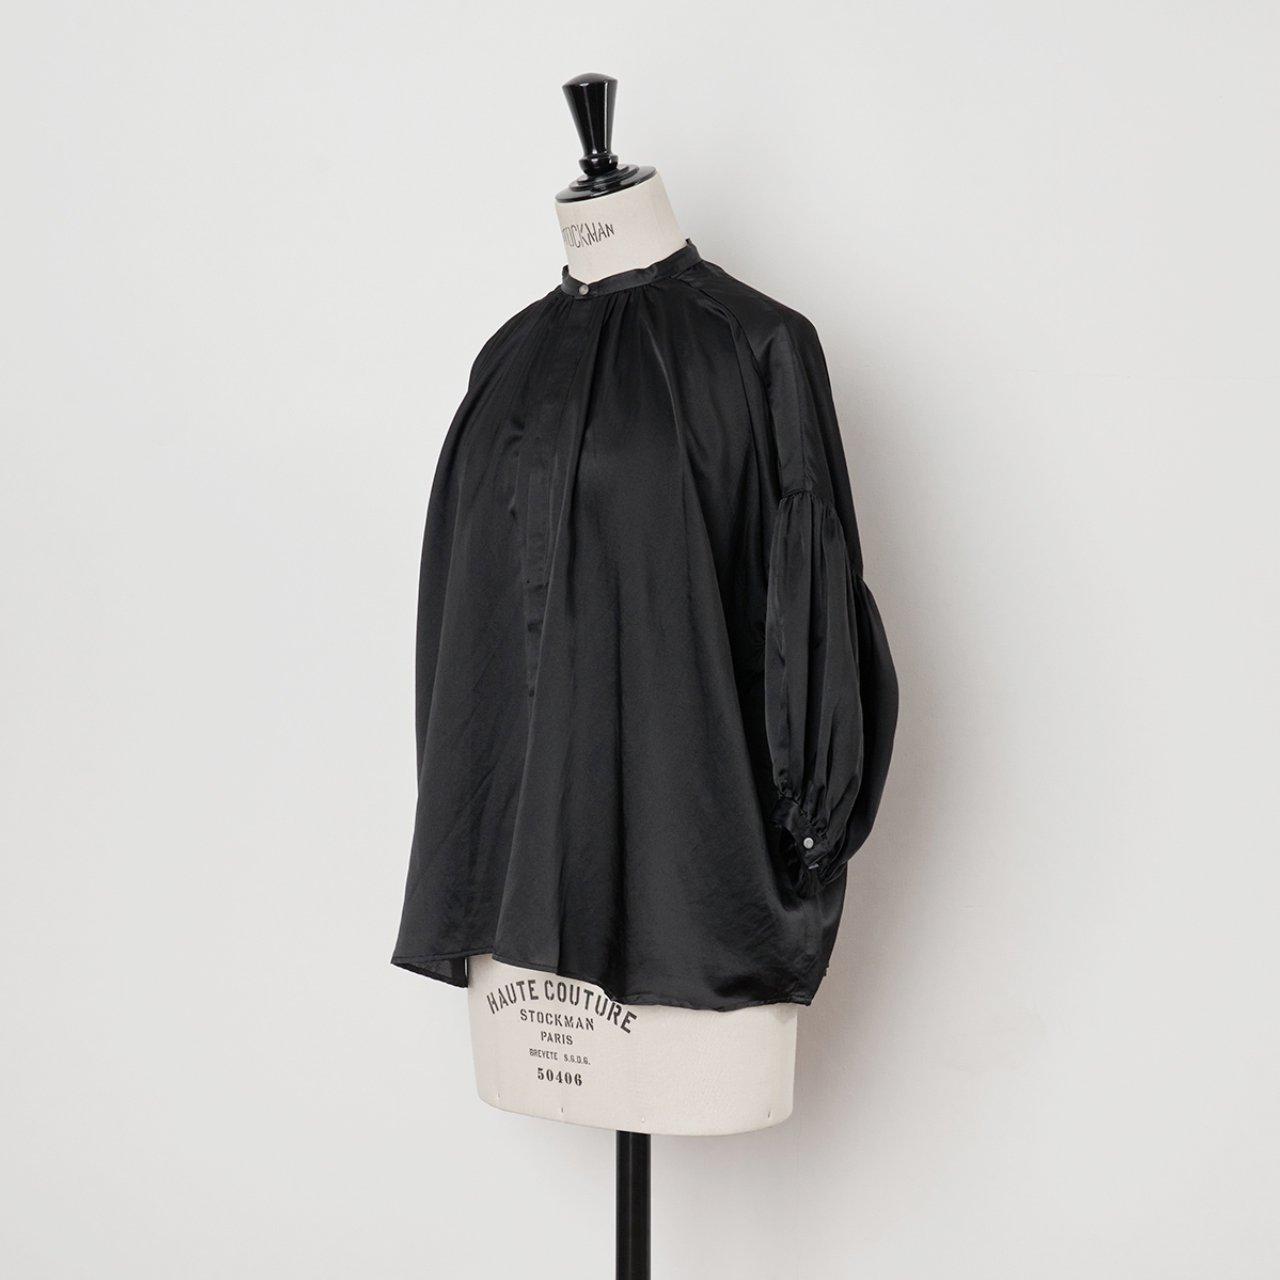 suzuki takayuki<BR>puff sleeve blouse<BR>Black